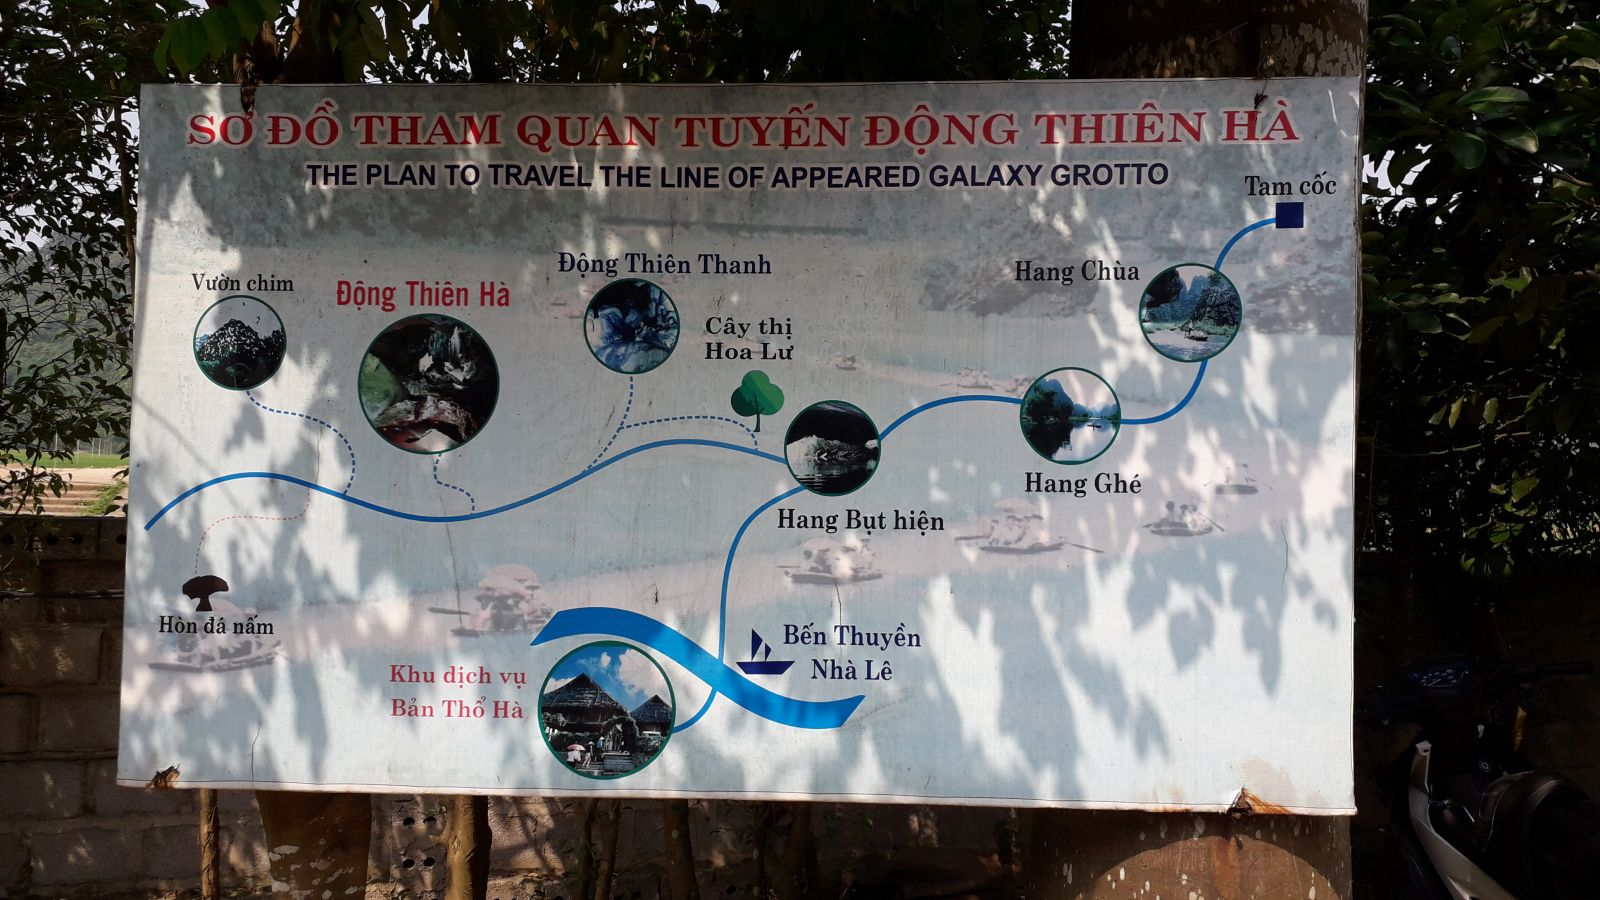 travel-map-thien-ha-galaxy